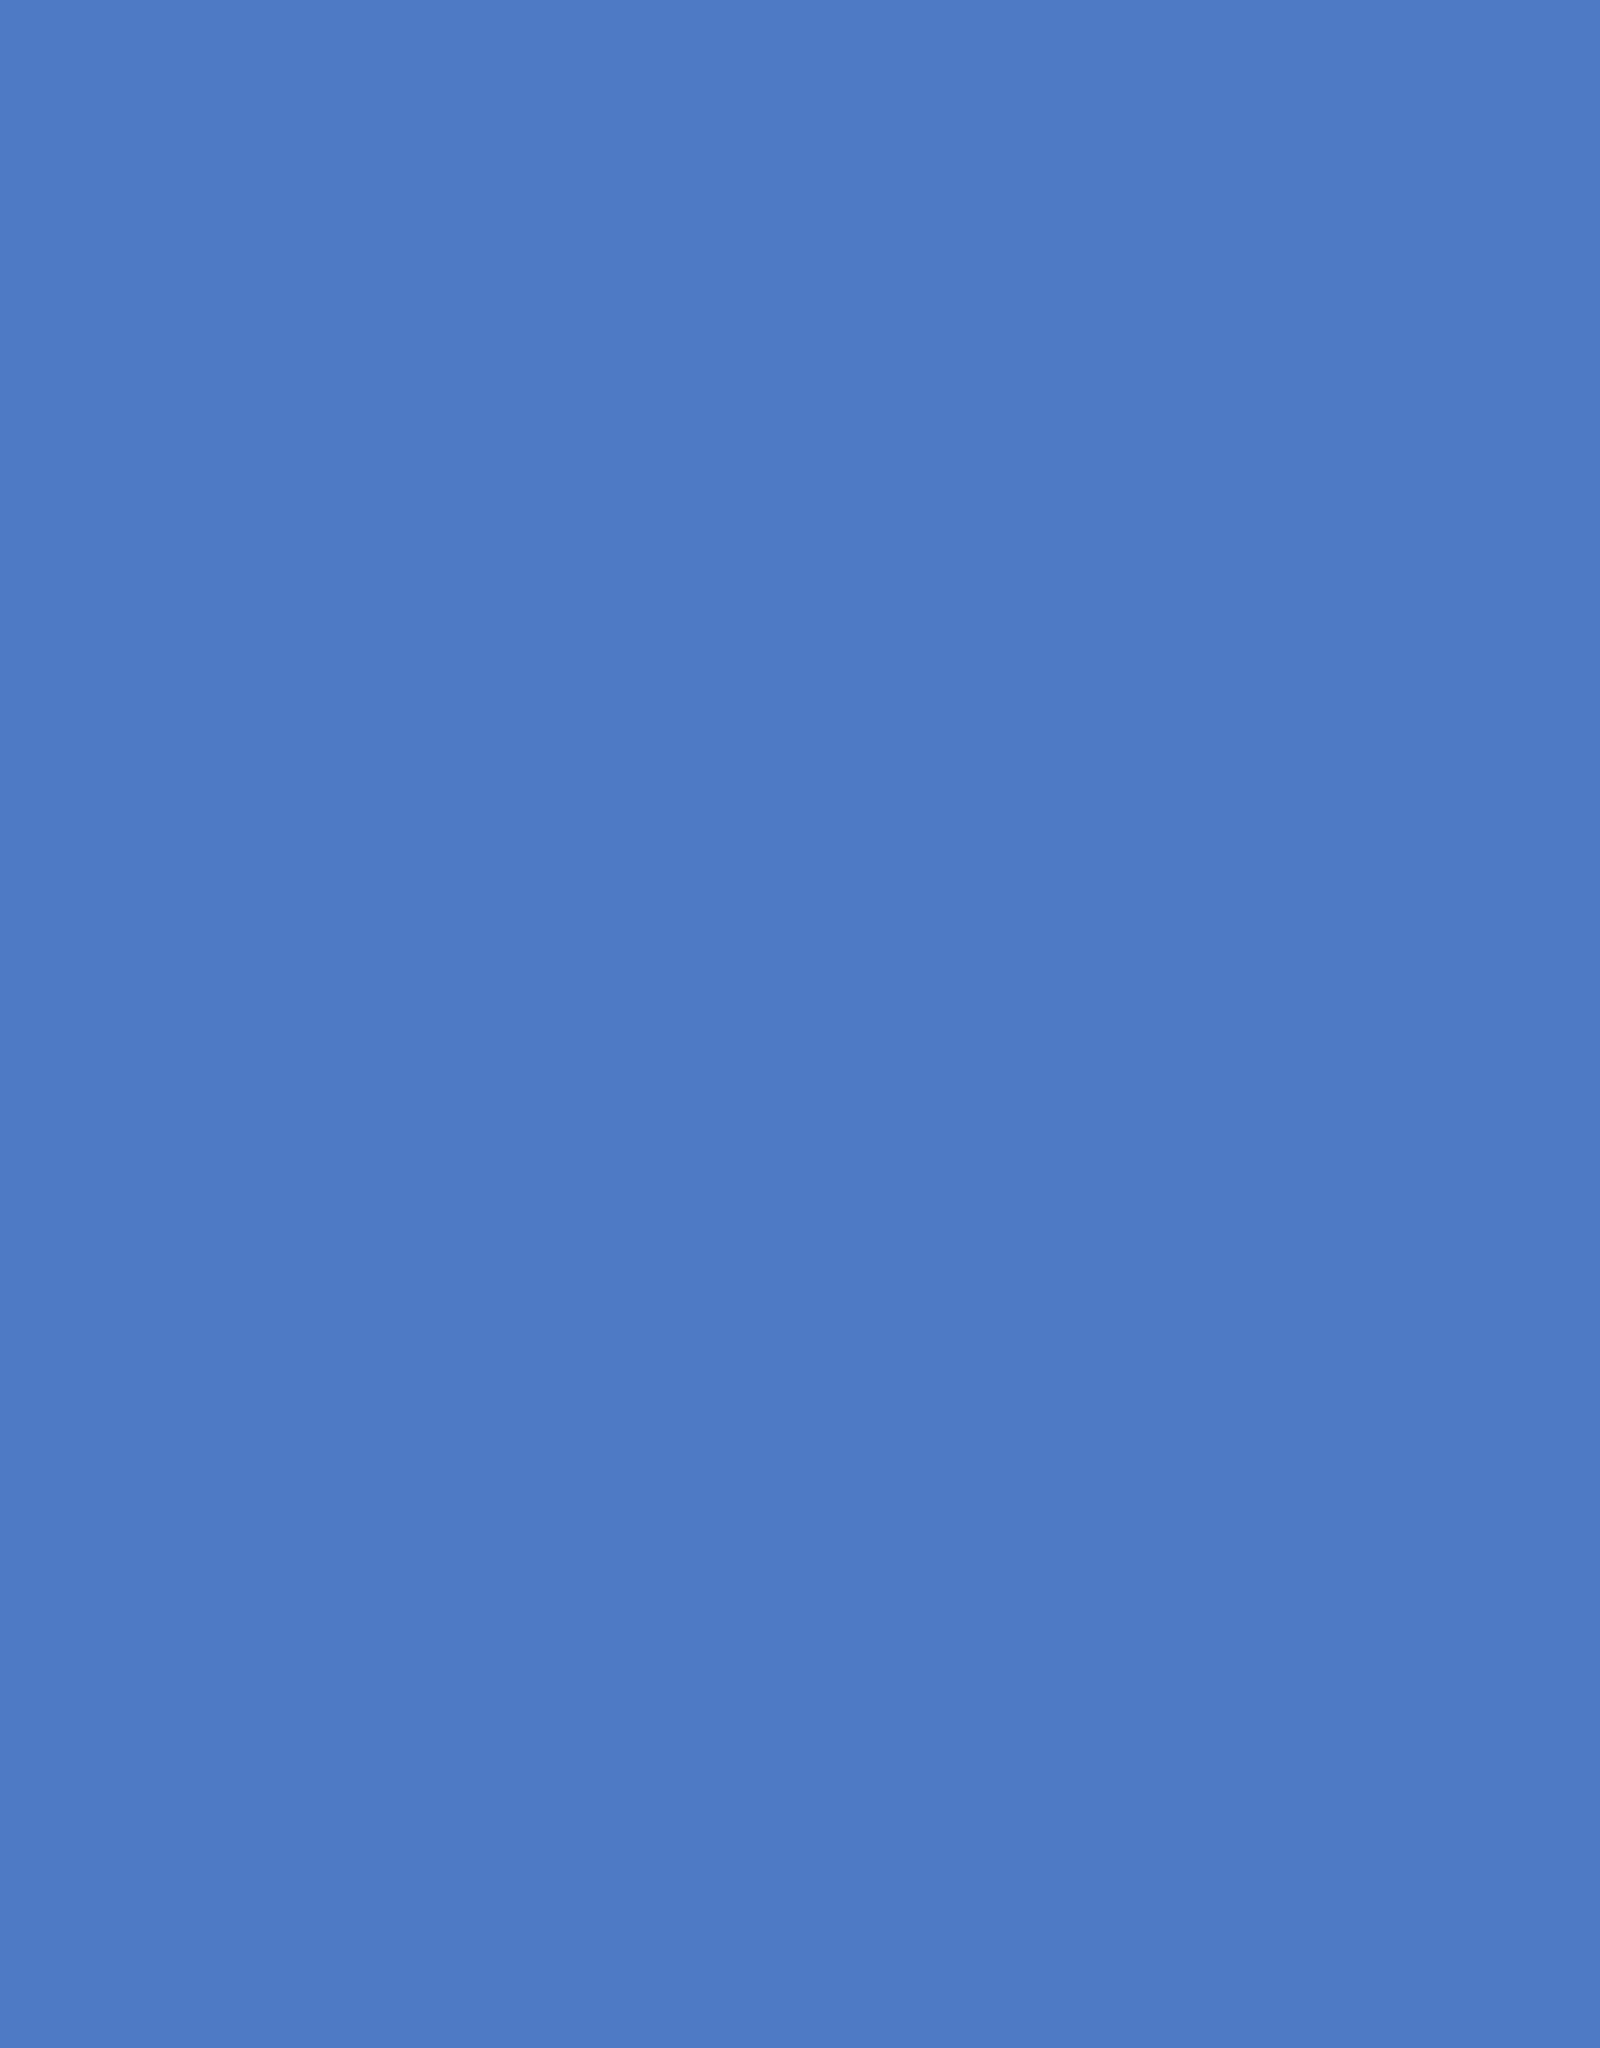 Superior Seamless Superior Seamless 4' Royal Blue #11 (Chroma Key compatible)